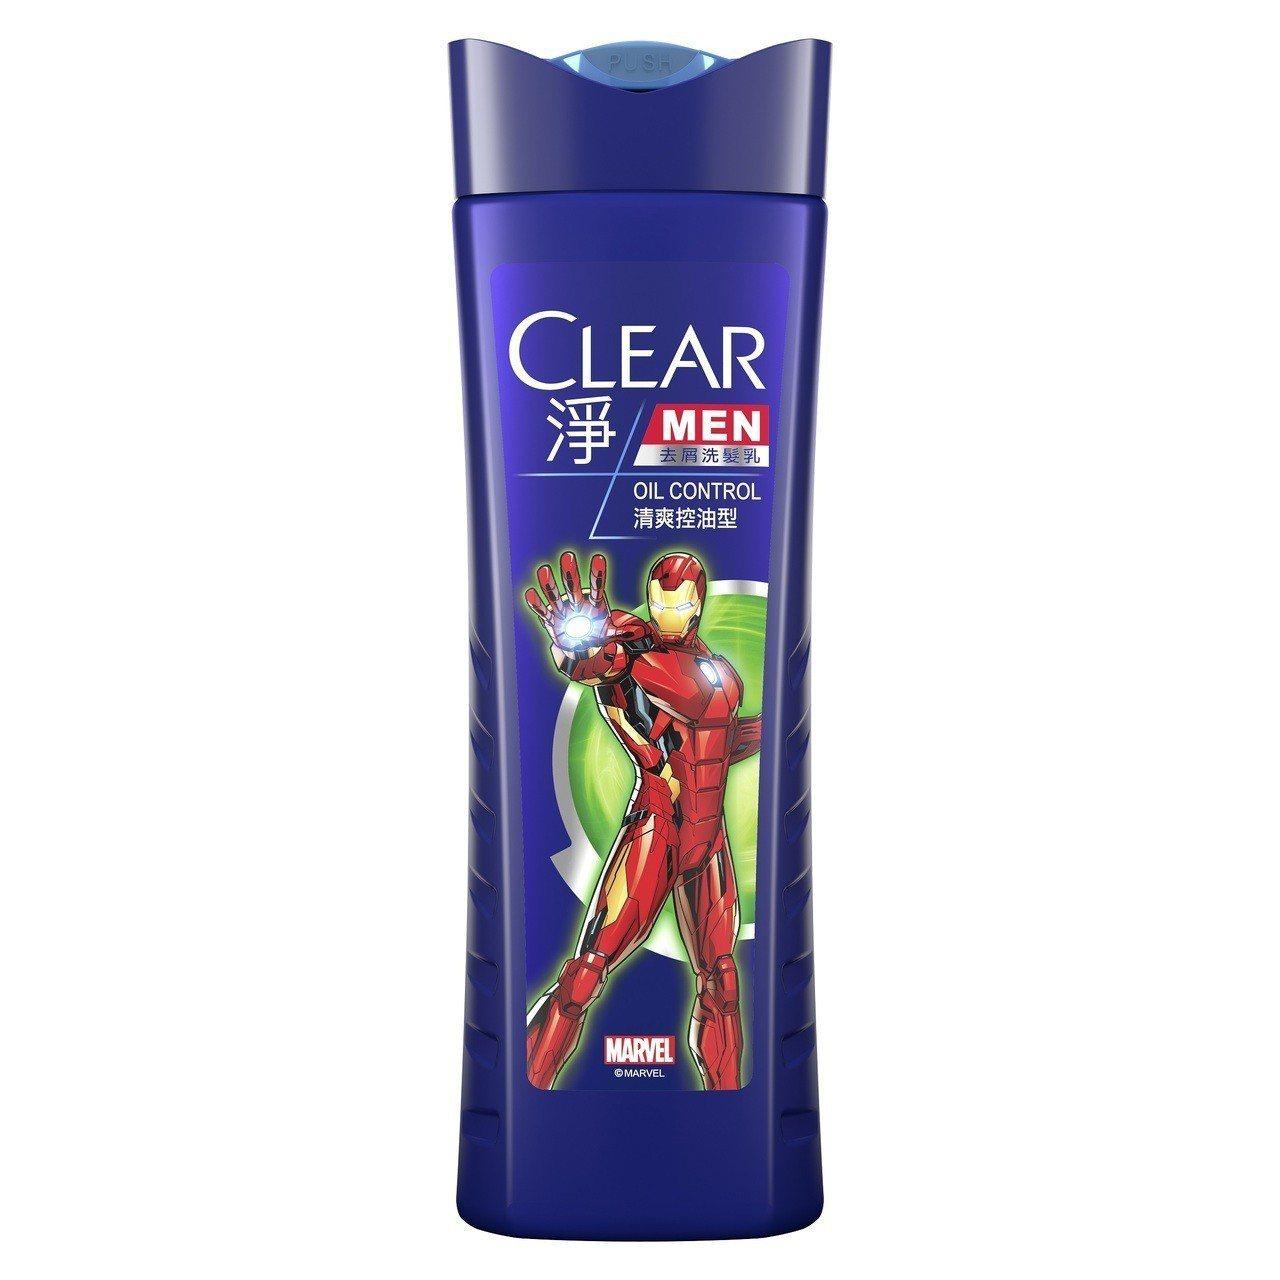 CLEAR淨男士去屑洗髮乳清爽控油型「鋼鐵人版」7-ELEVEN獨家限量小包裝,...